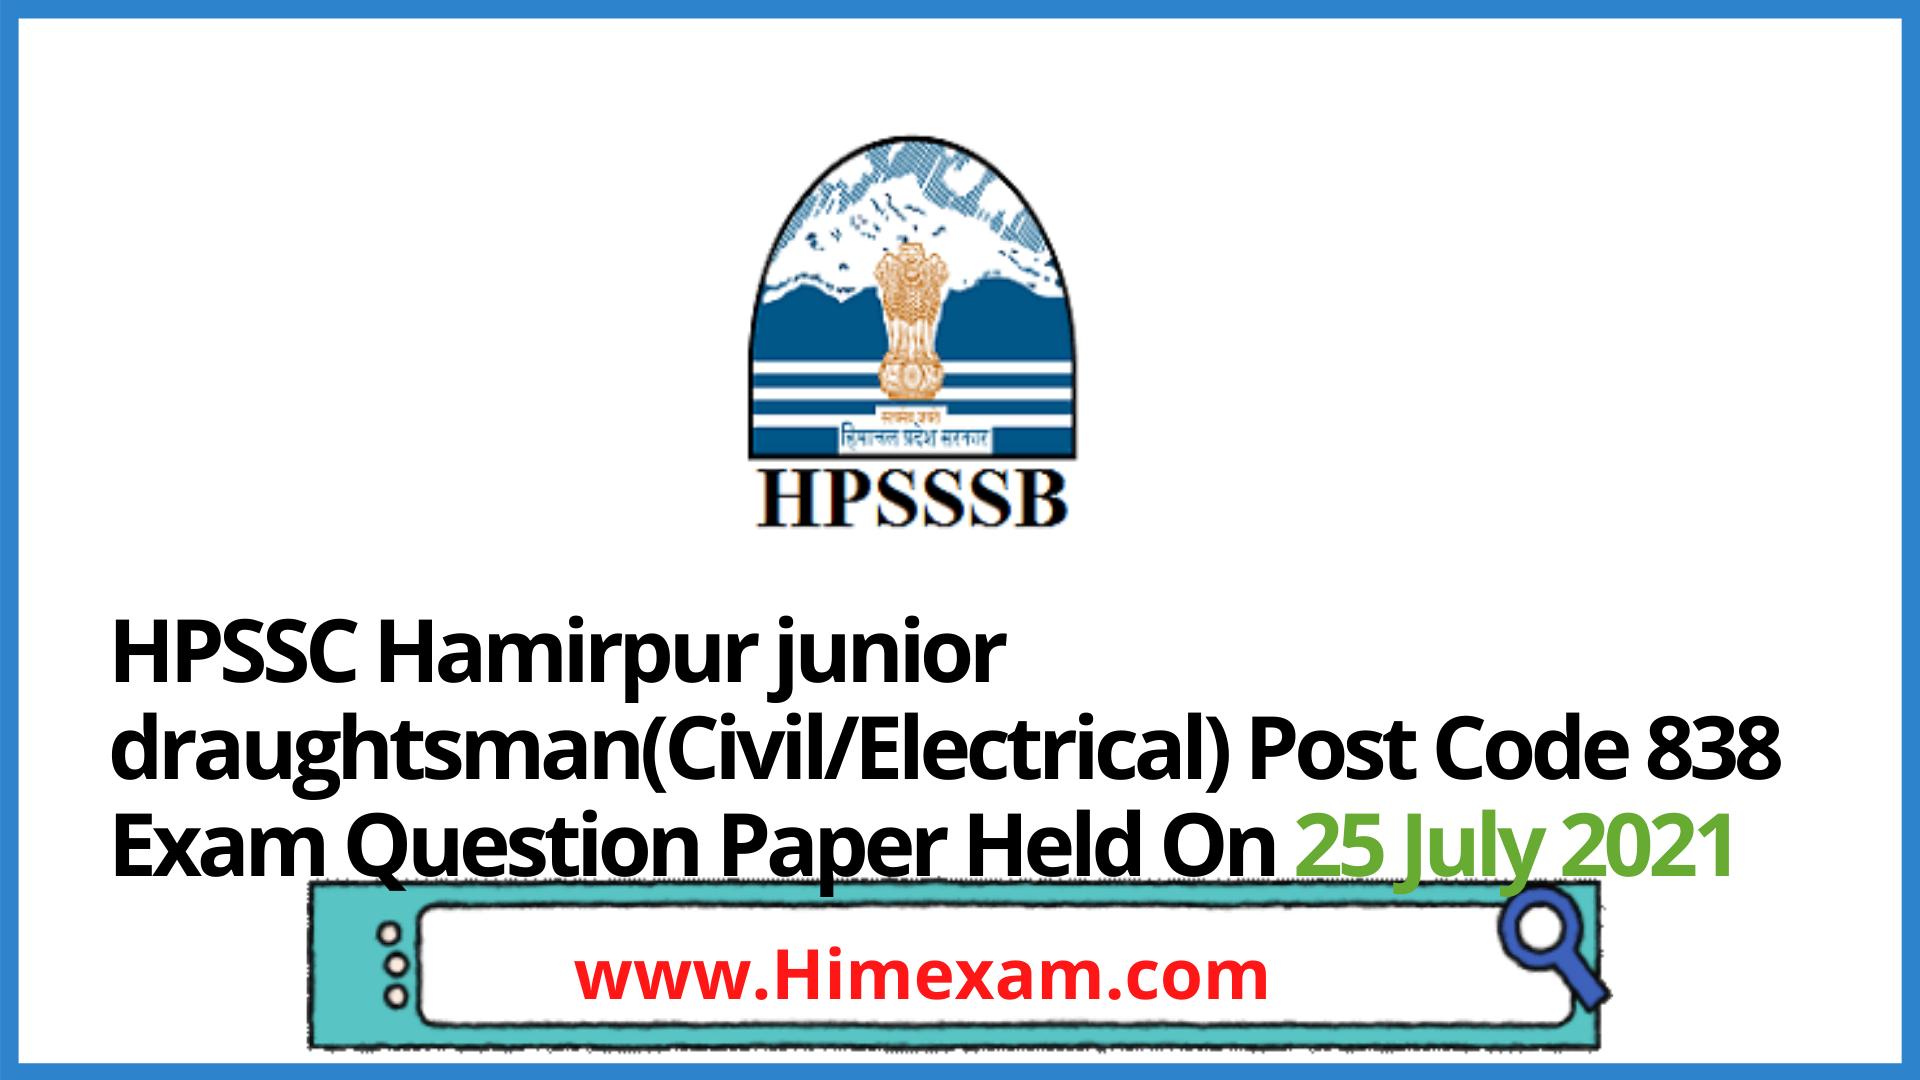 HPSSC Hamirpur junior draughtsman(Civil/Electrical) Post Code 838 Exam Question Paper Held On 25 July 2021